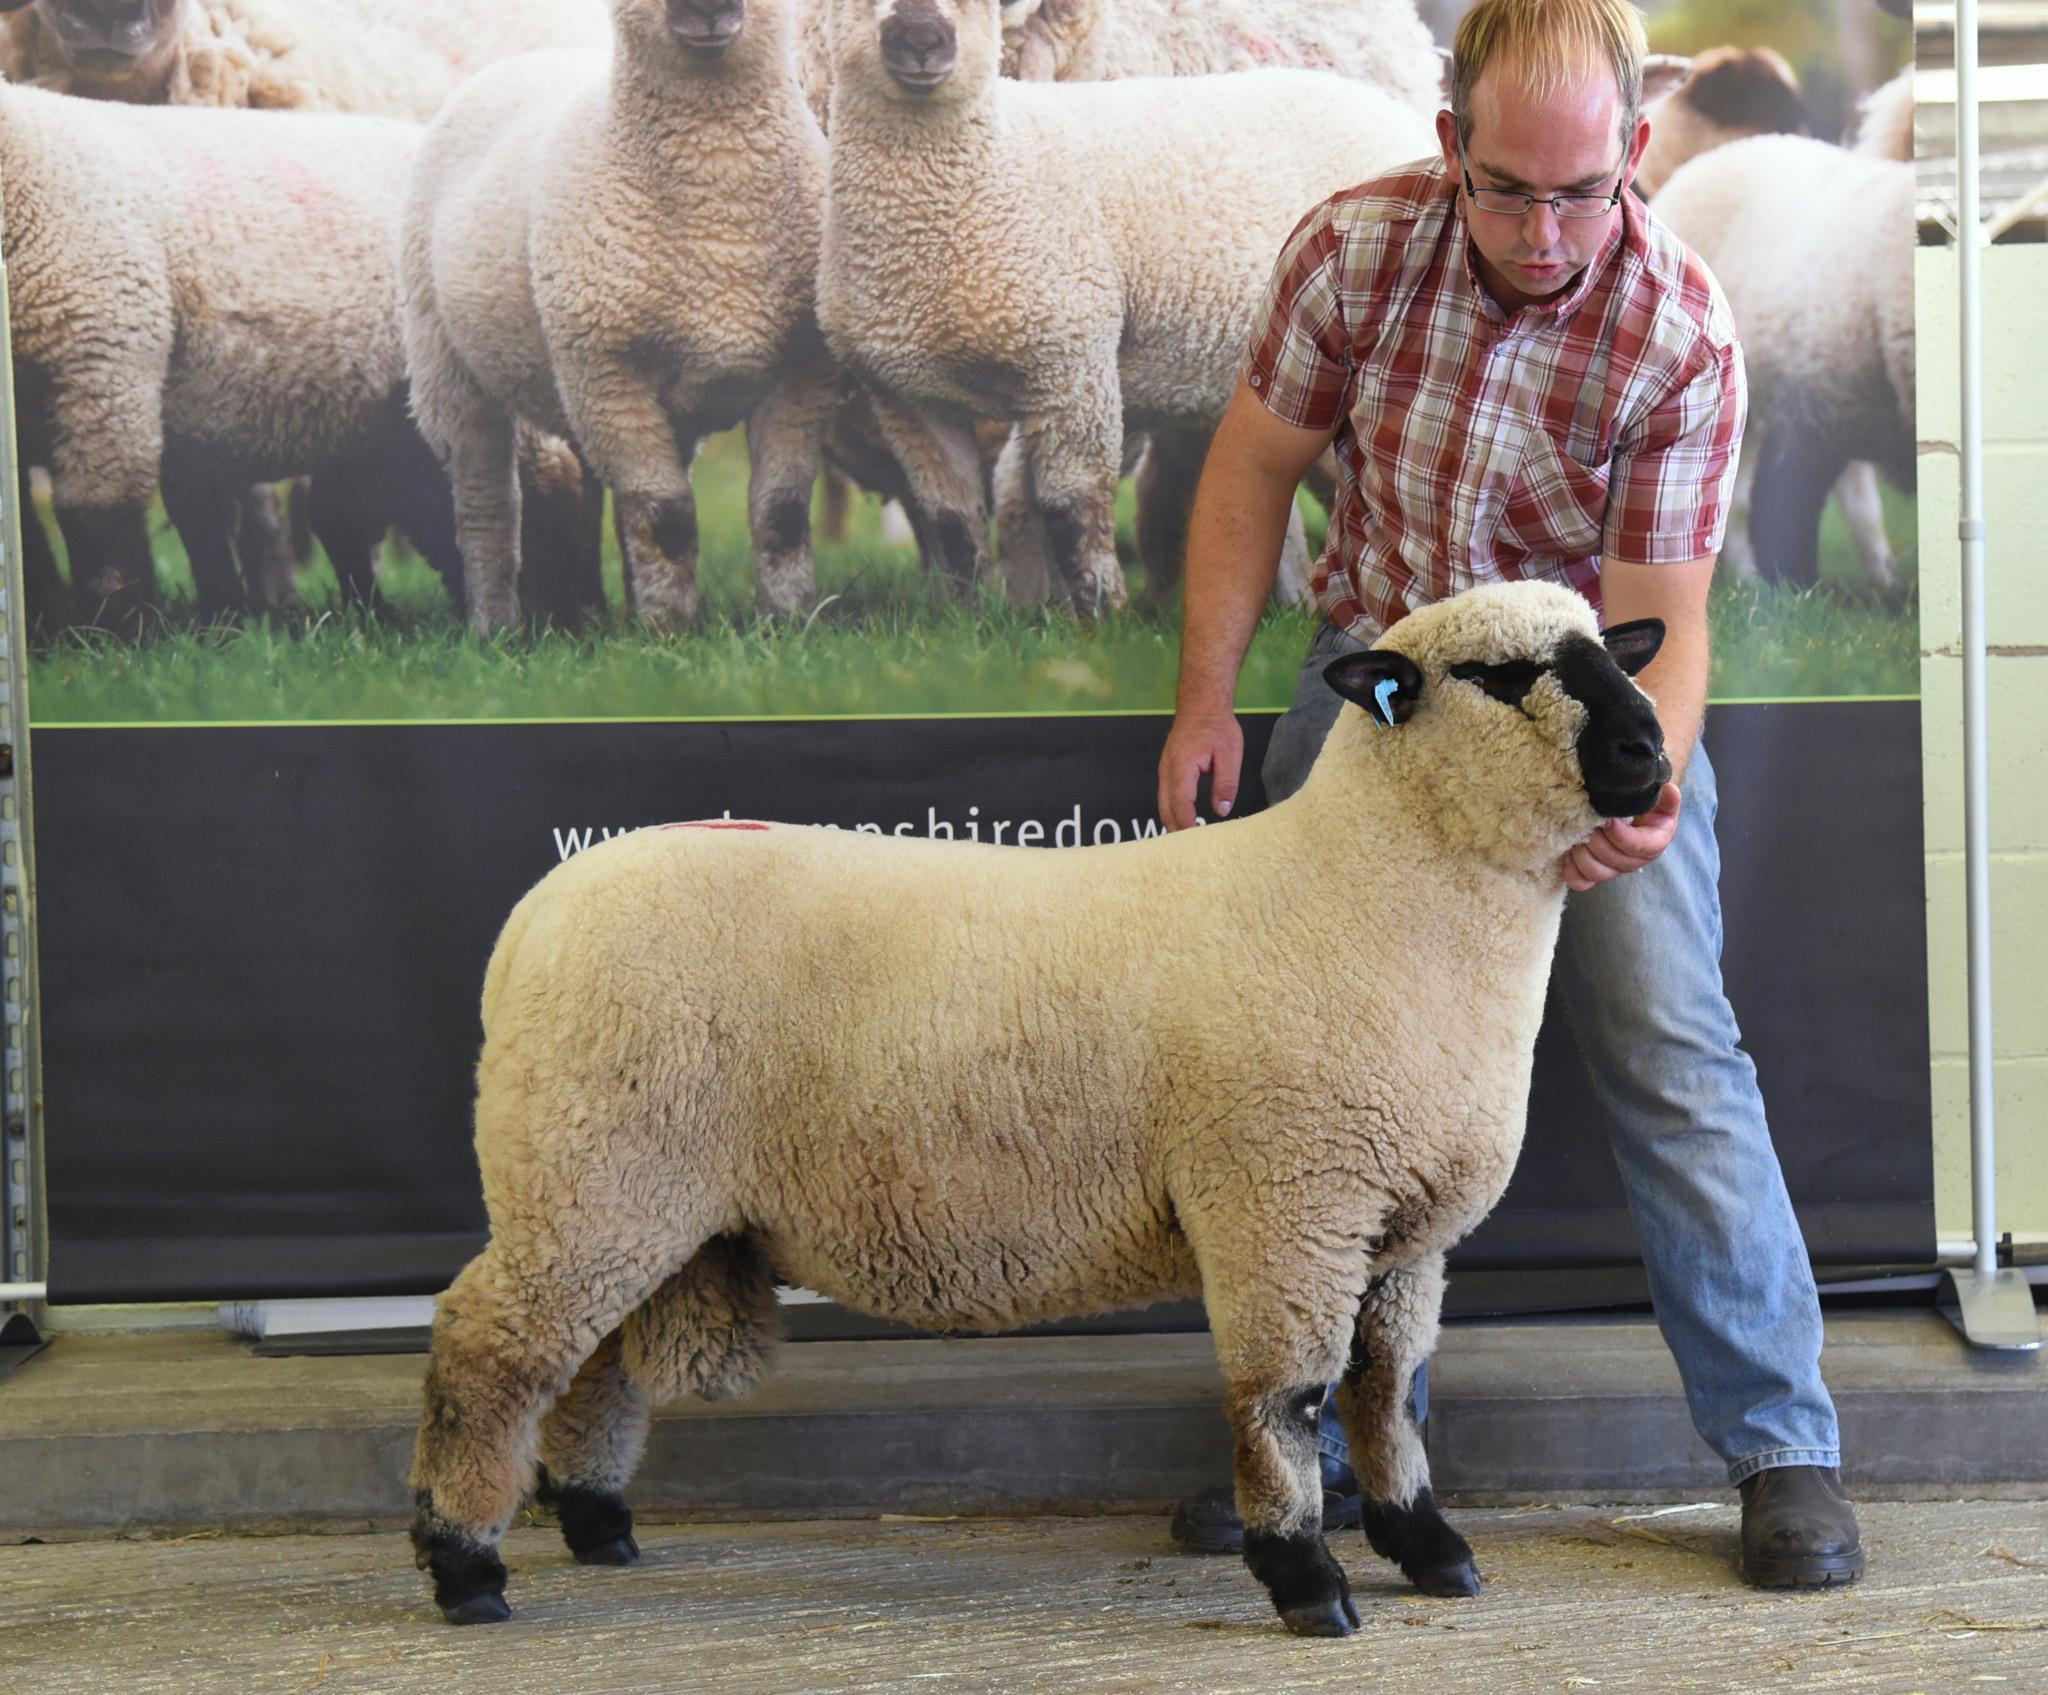 Leading Price, Ram Lamb from Matthew Jones and Rebecca Smith, BIRCHFIELD FLOCK